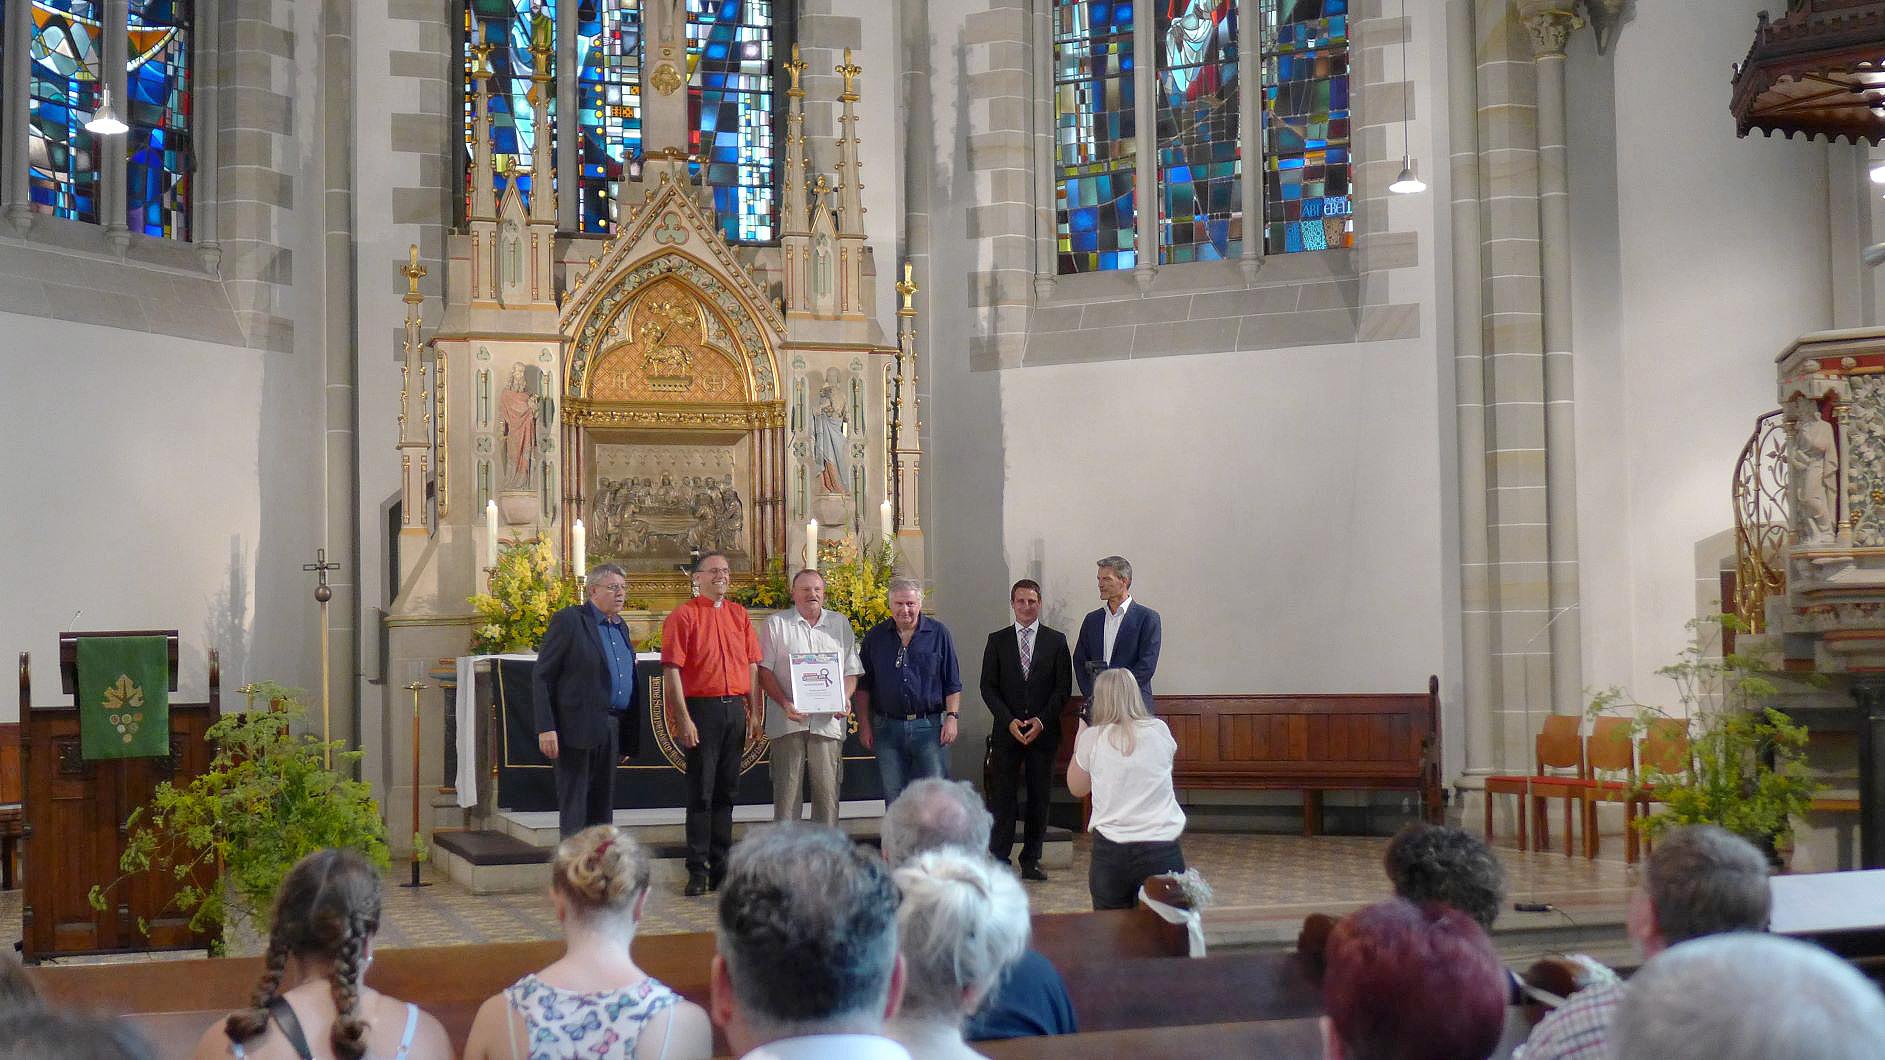 Titanen on tour - Preisverleihung Chrismon Gemeinde 2019